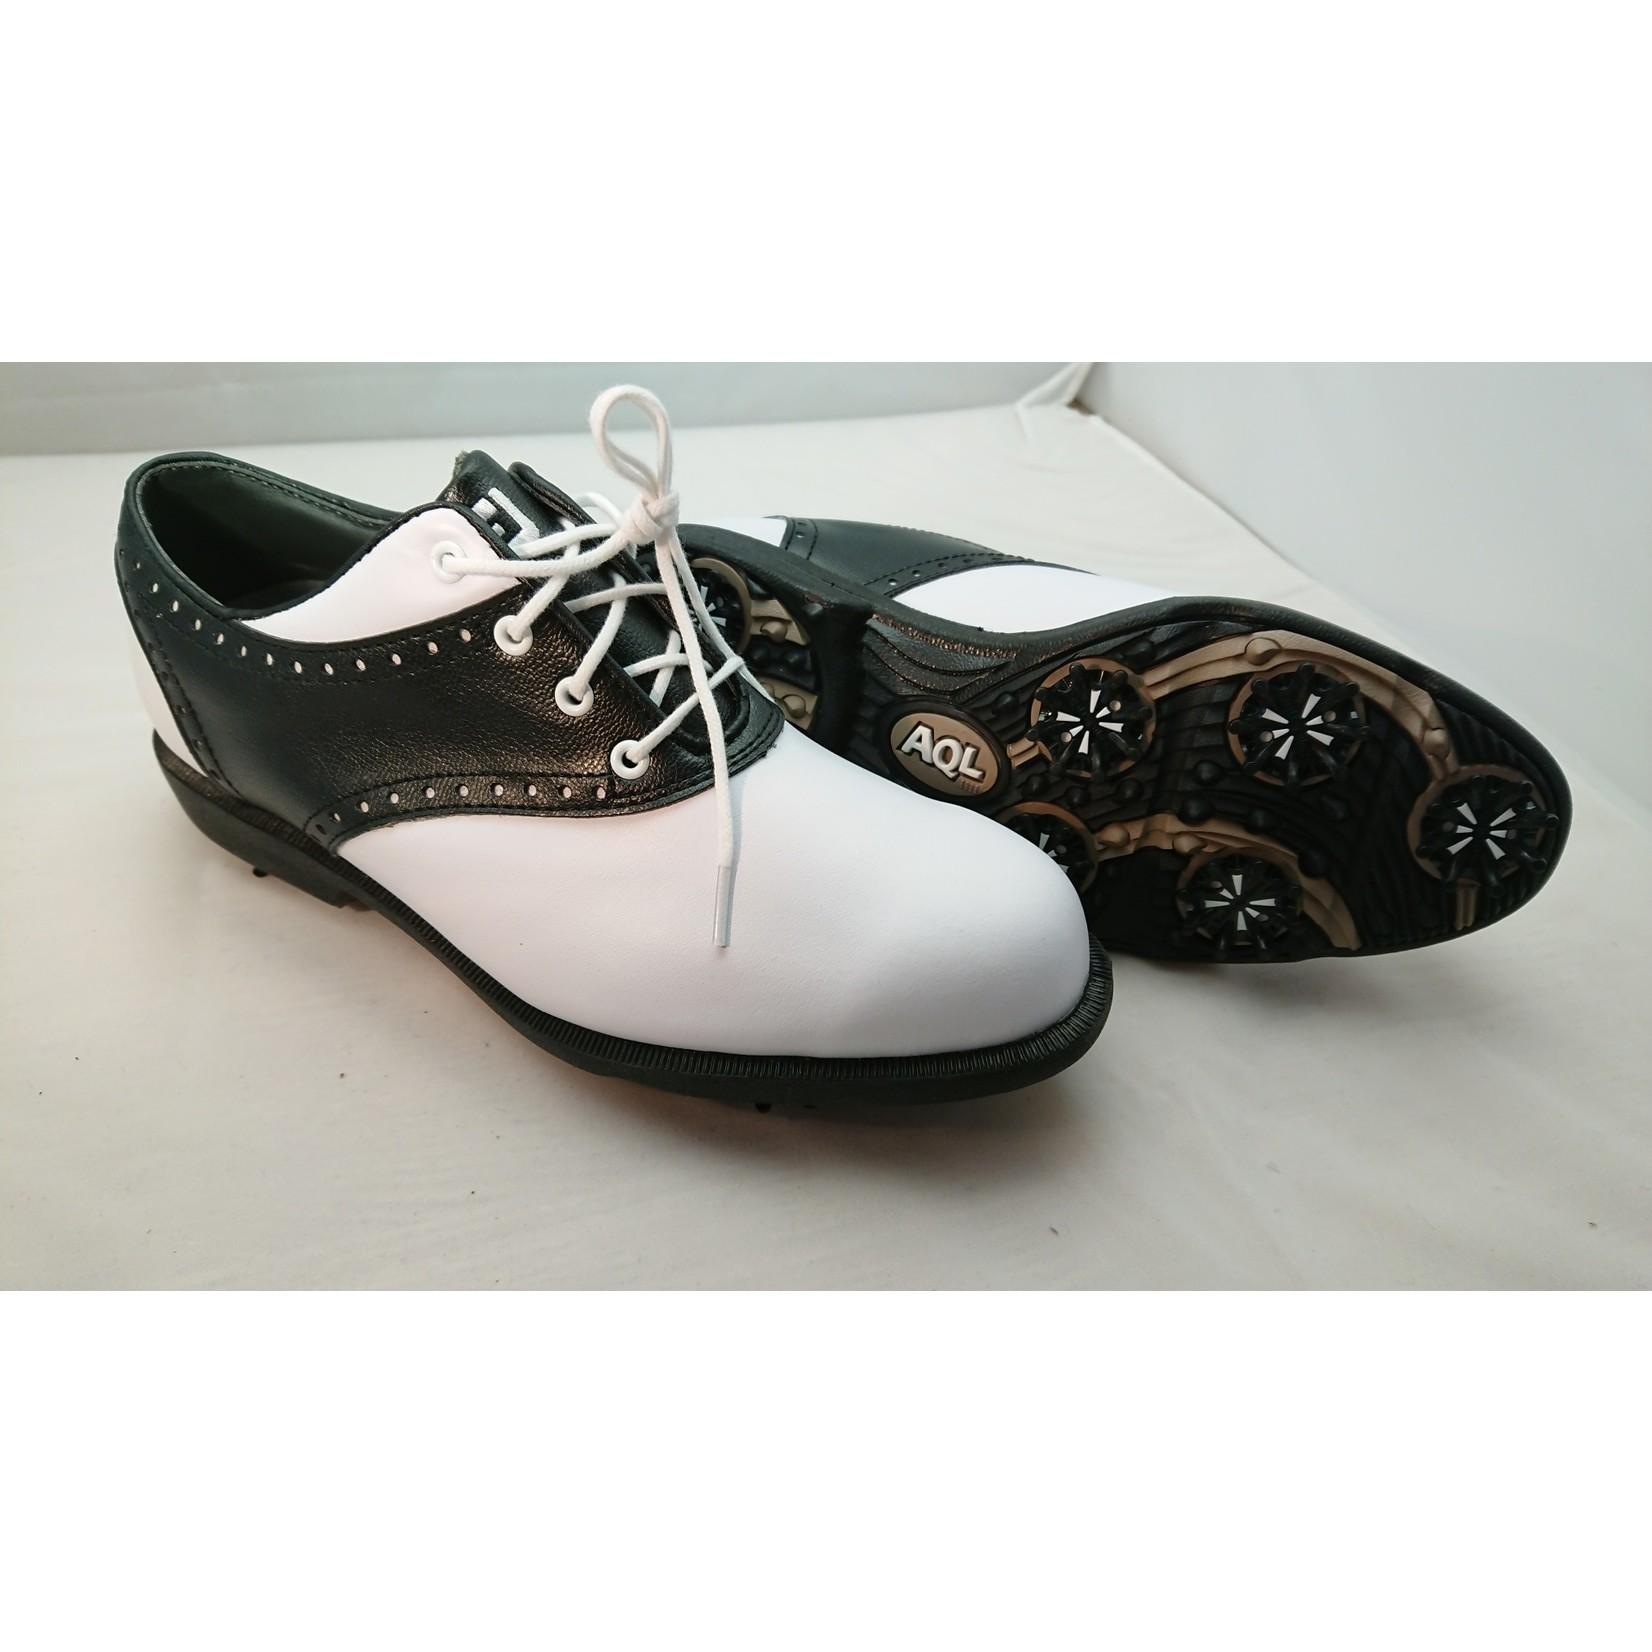 Footjoy Footjoy AQL wit/zwart 37M